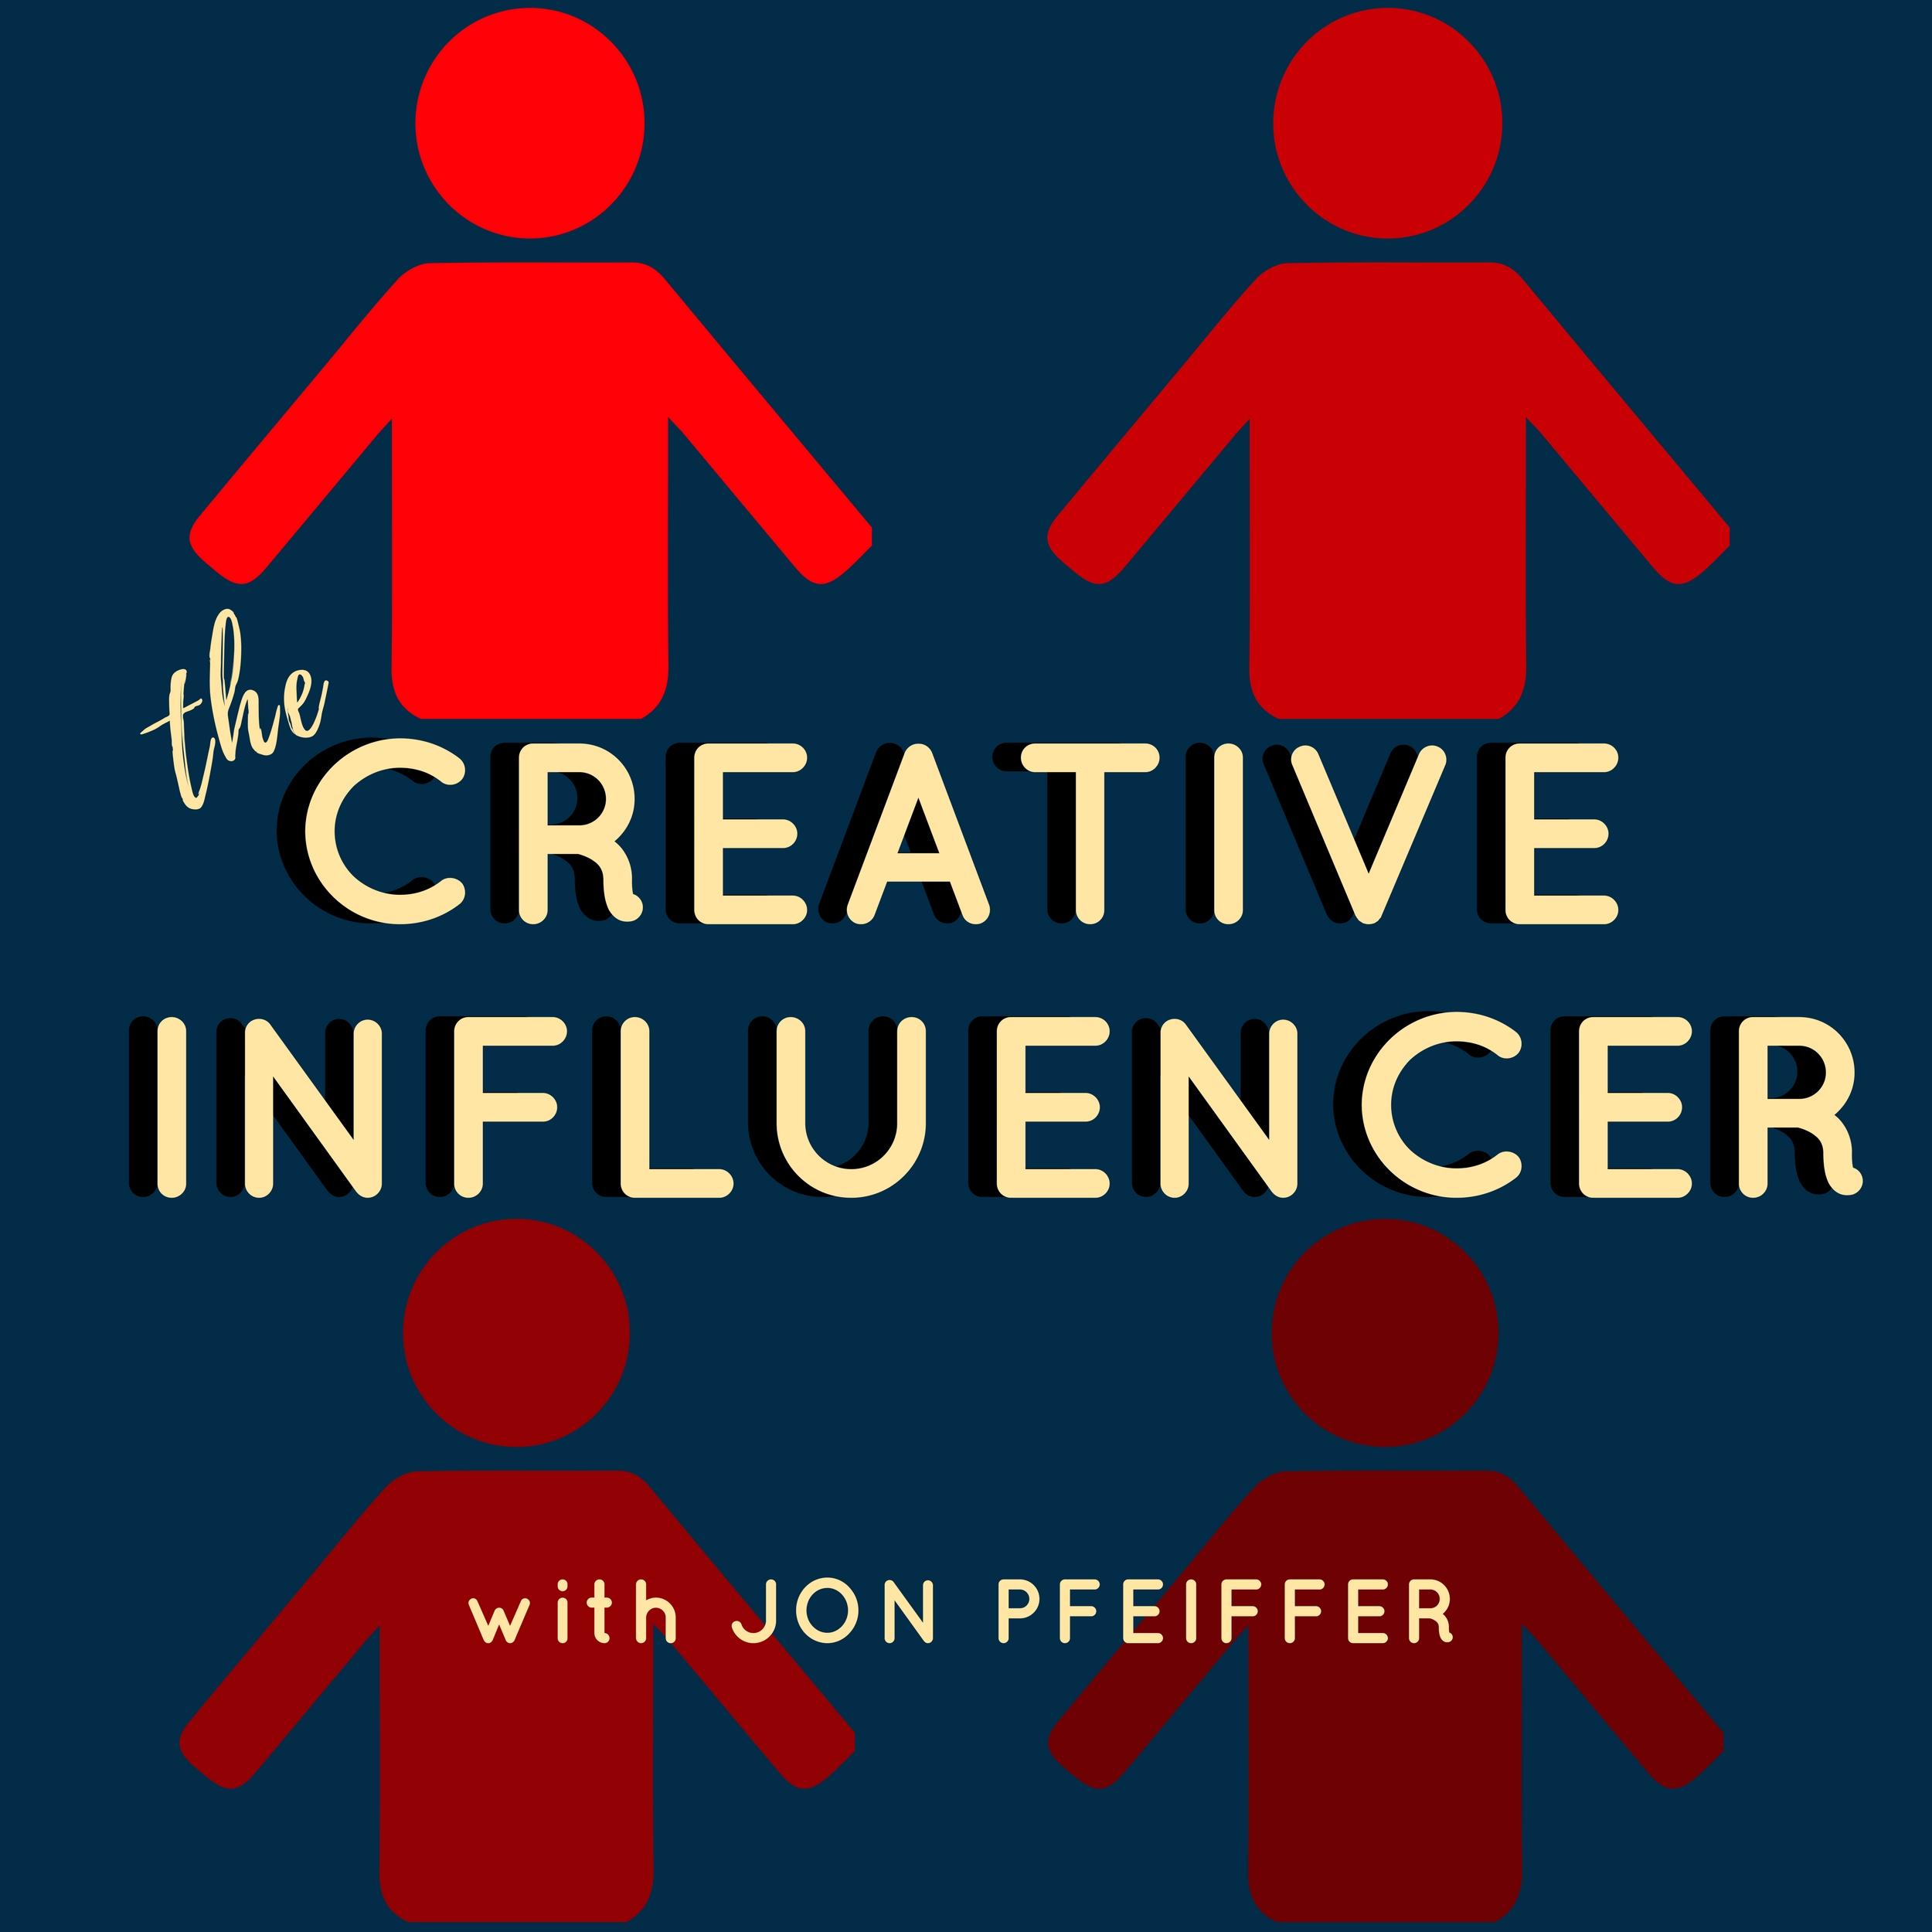 The Creative Influencer show art